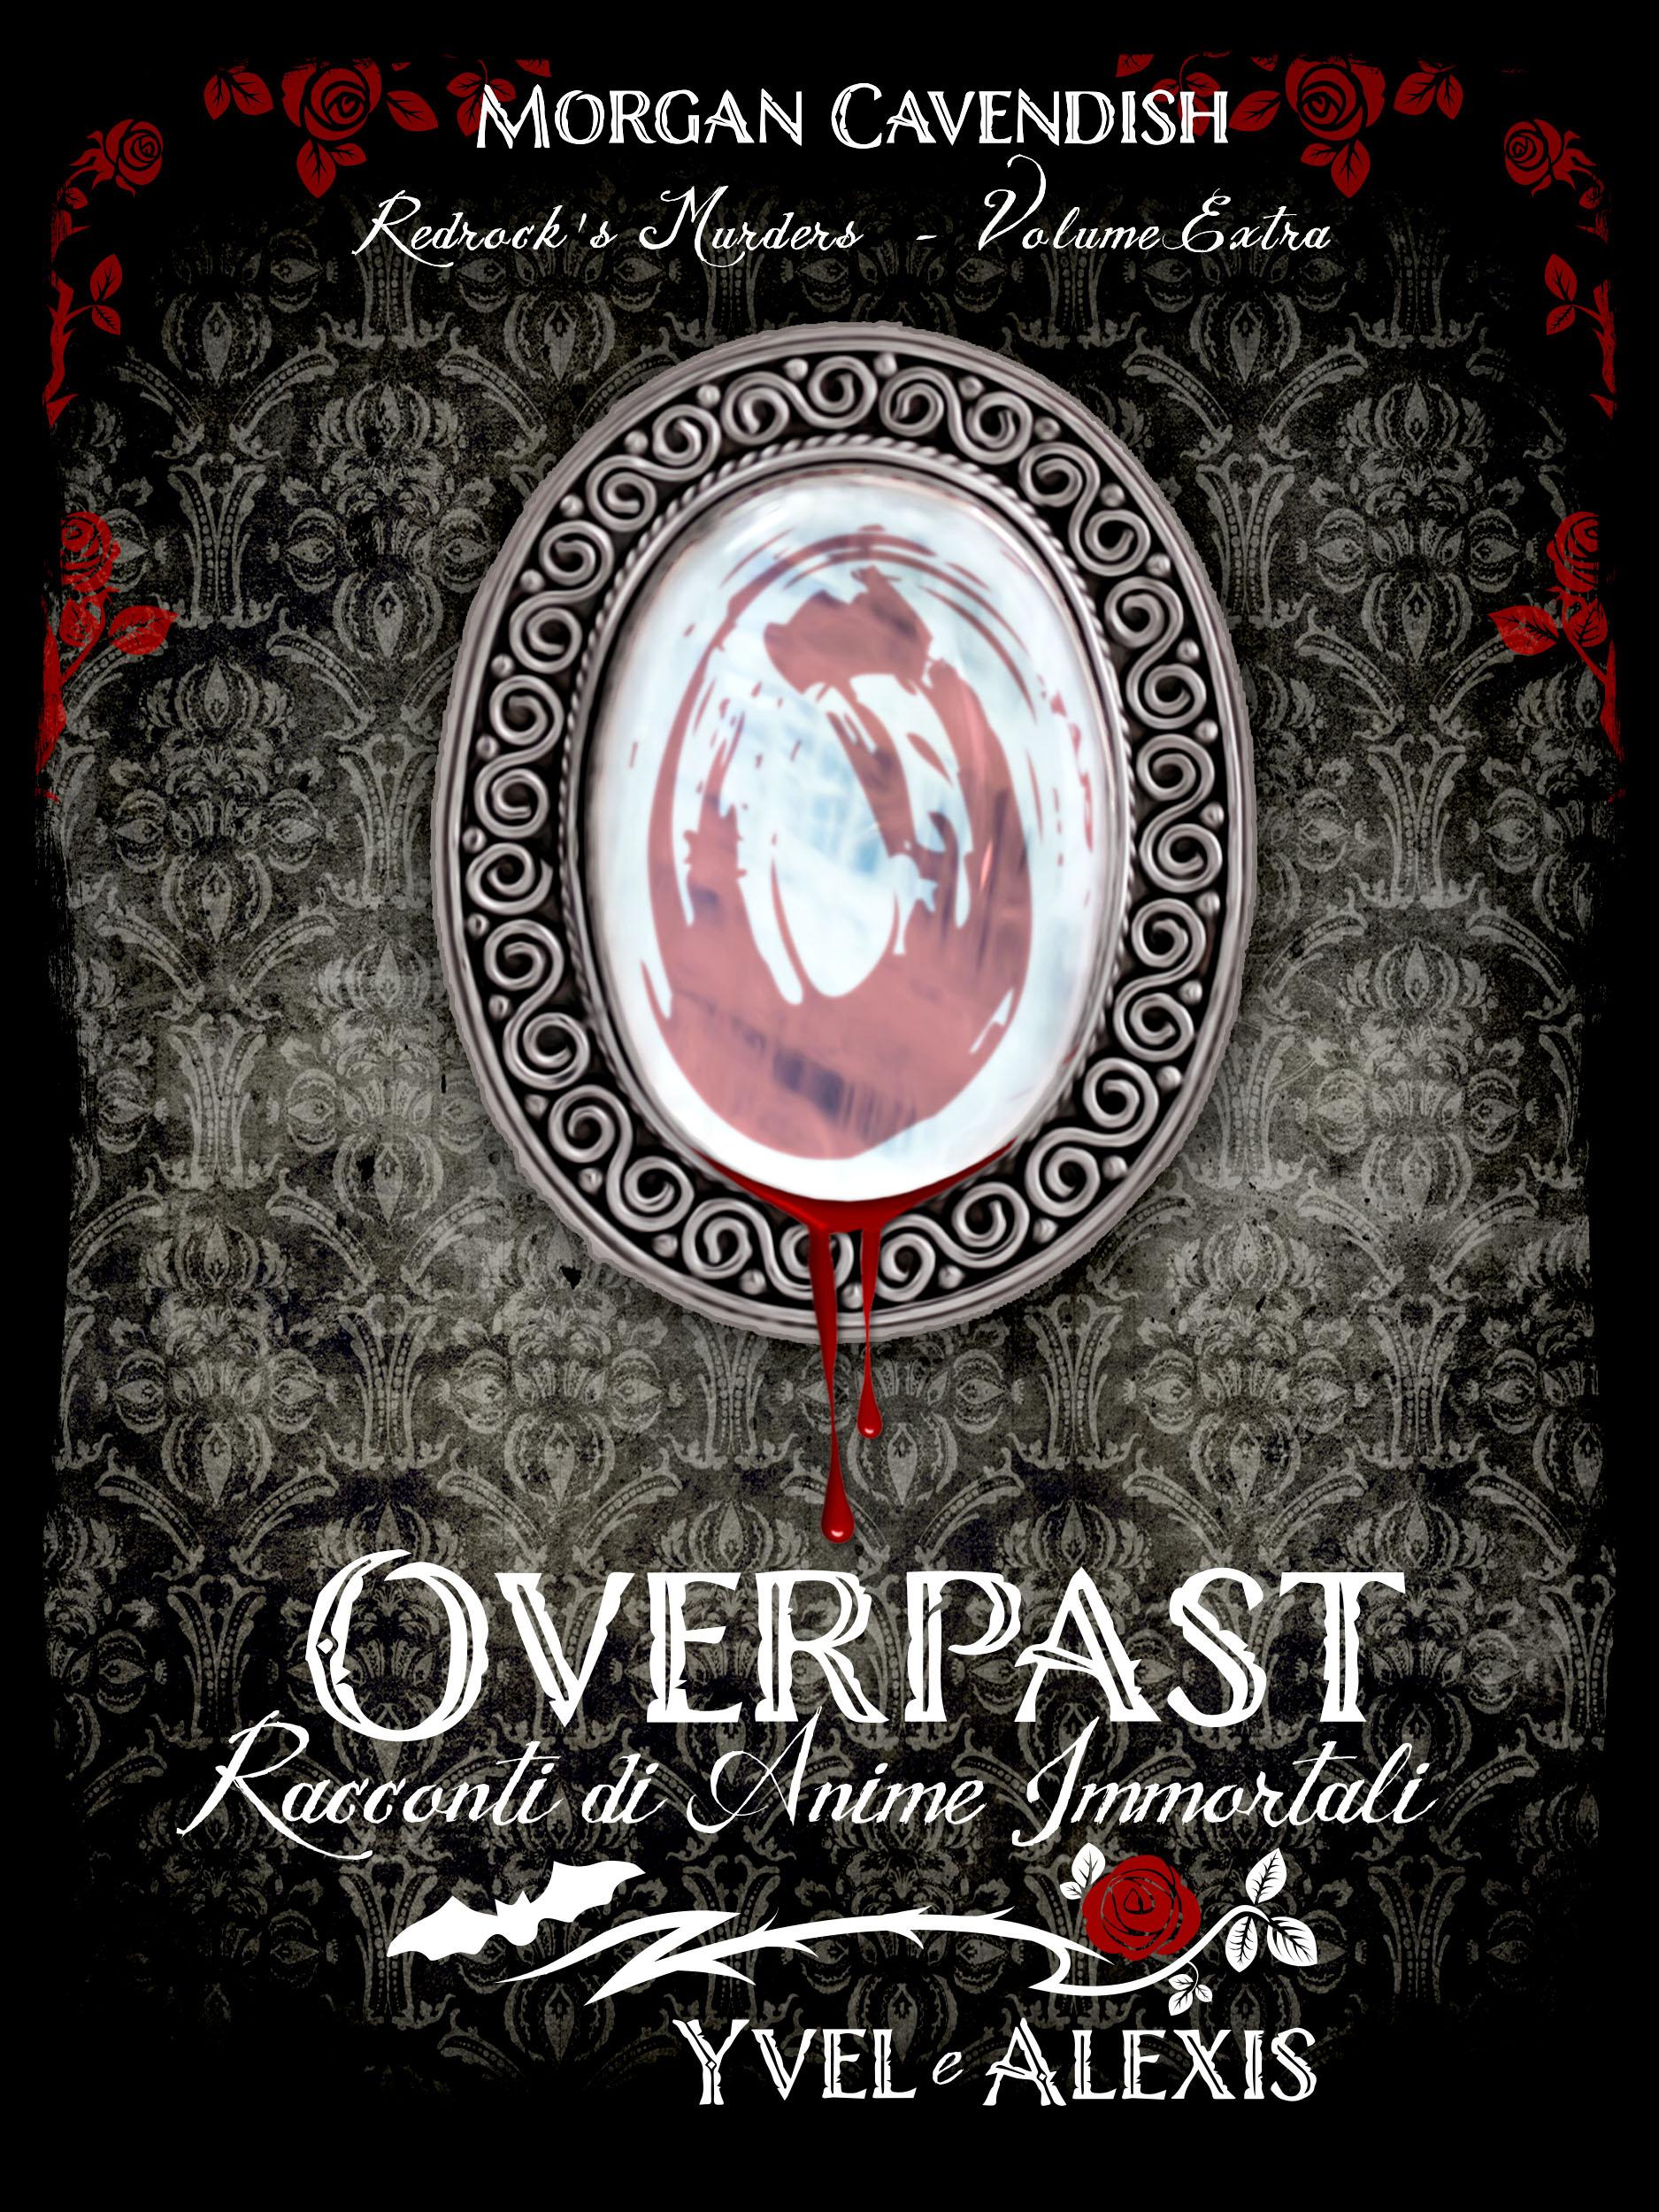 Ally Rose_Overpast Racconti Immortali